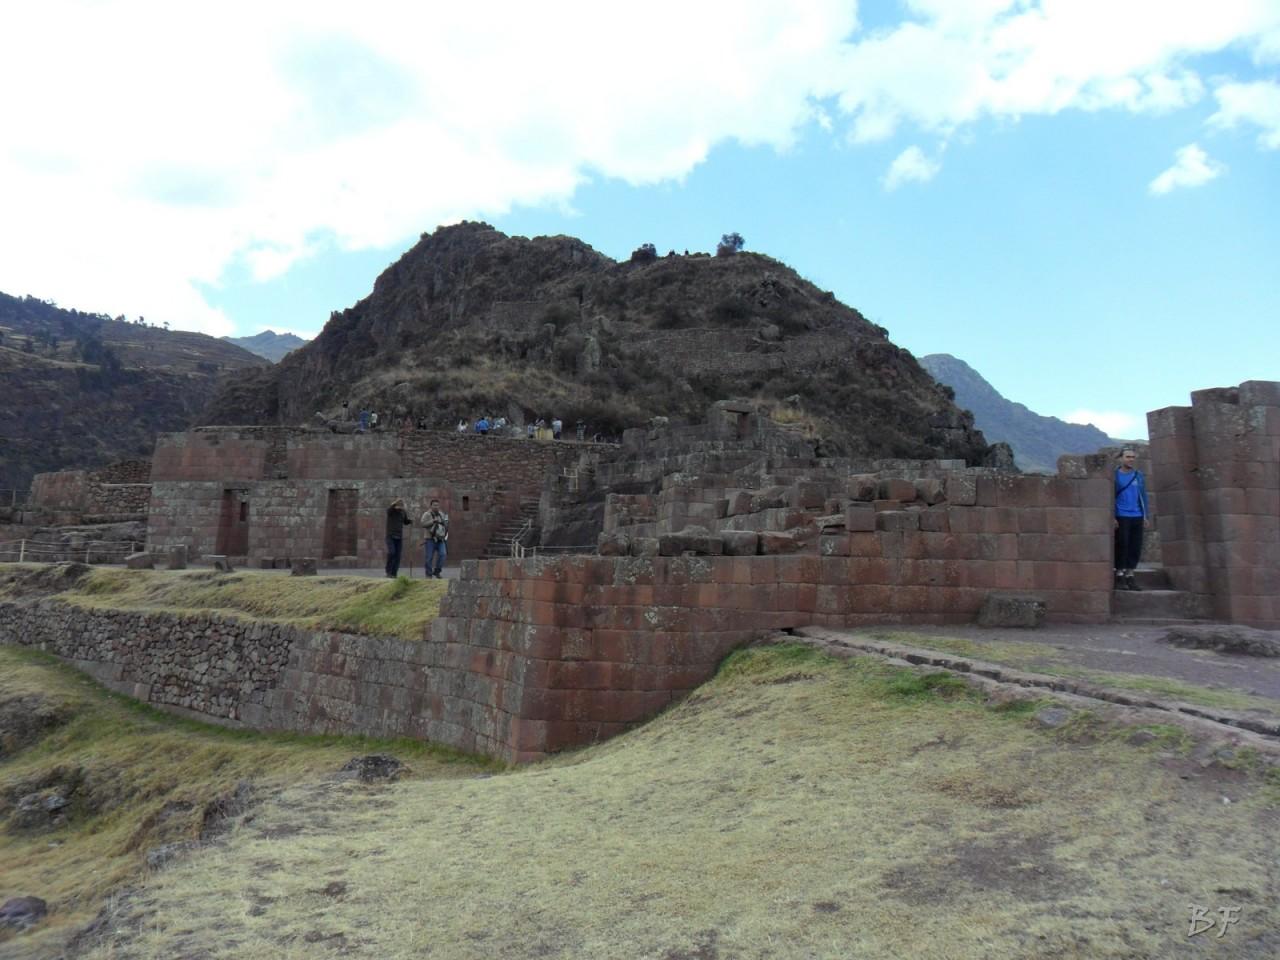 Mura-Poligonali-Megaliti-Altari-Rupestri-Pisac-Cusco-Perù-75